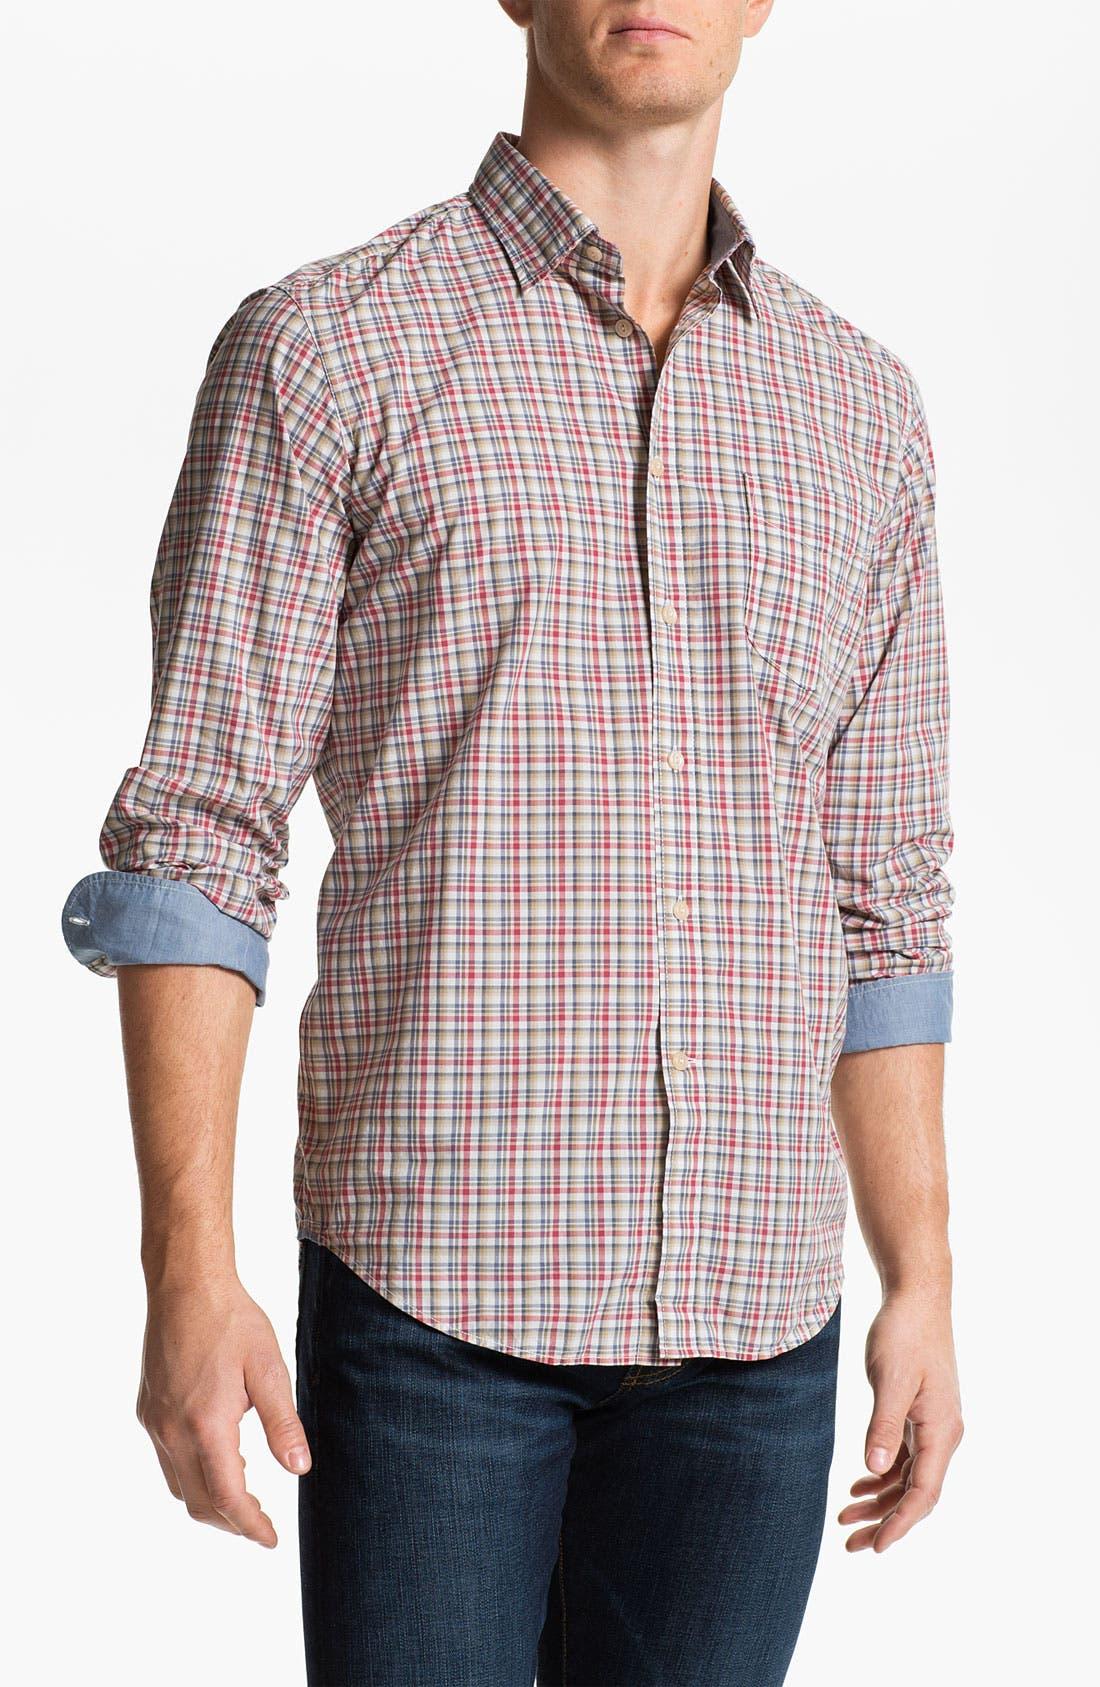 Alternate Image 1 Selected - Façonnable Jeans Sport Shirt